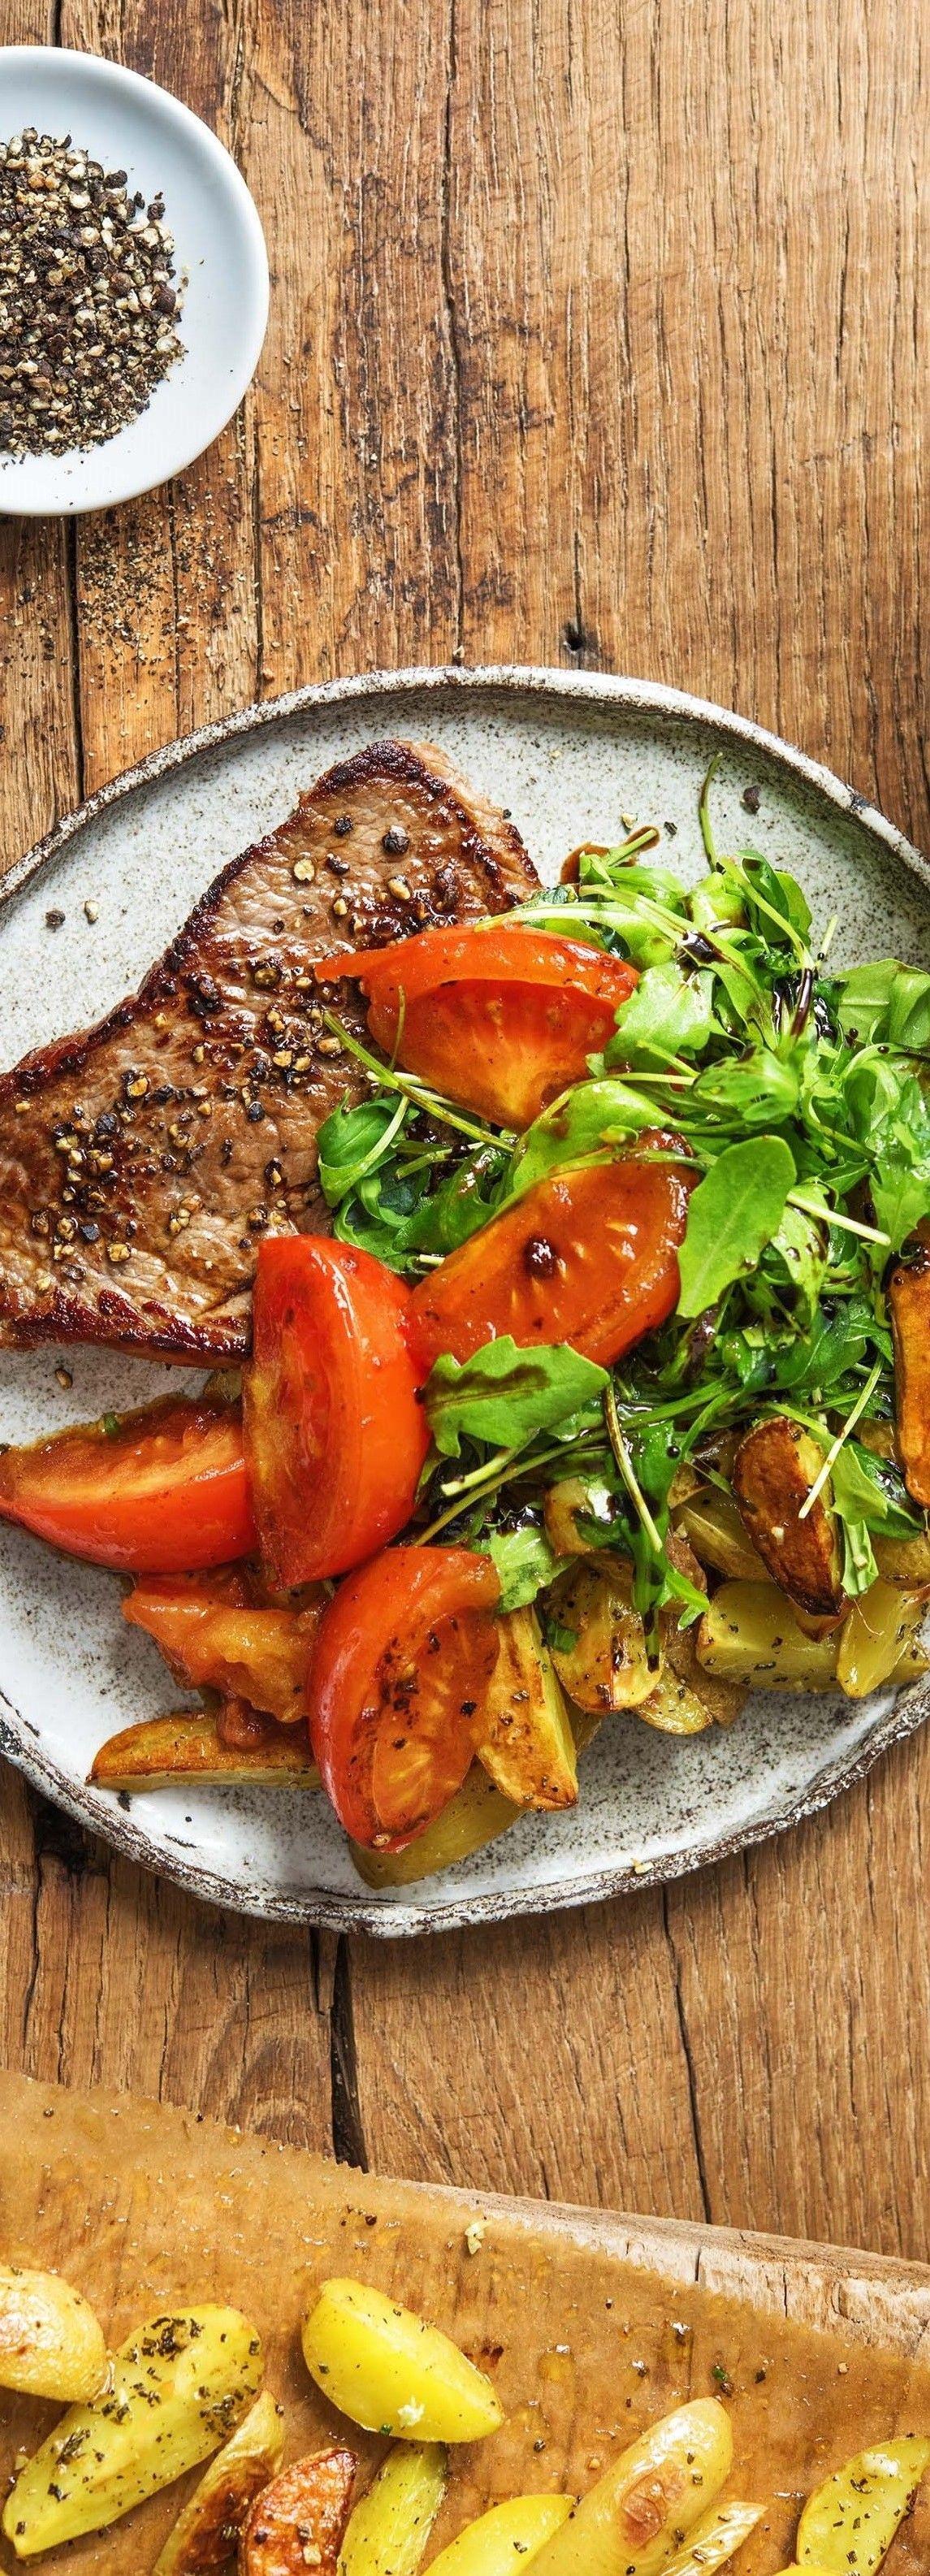 Rindersteak mit geschmorten Tomaten Rezept | HelloFresh